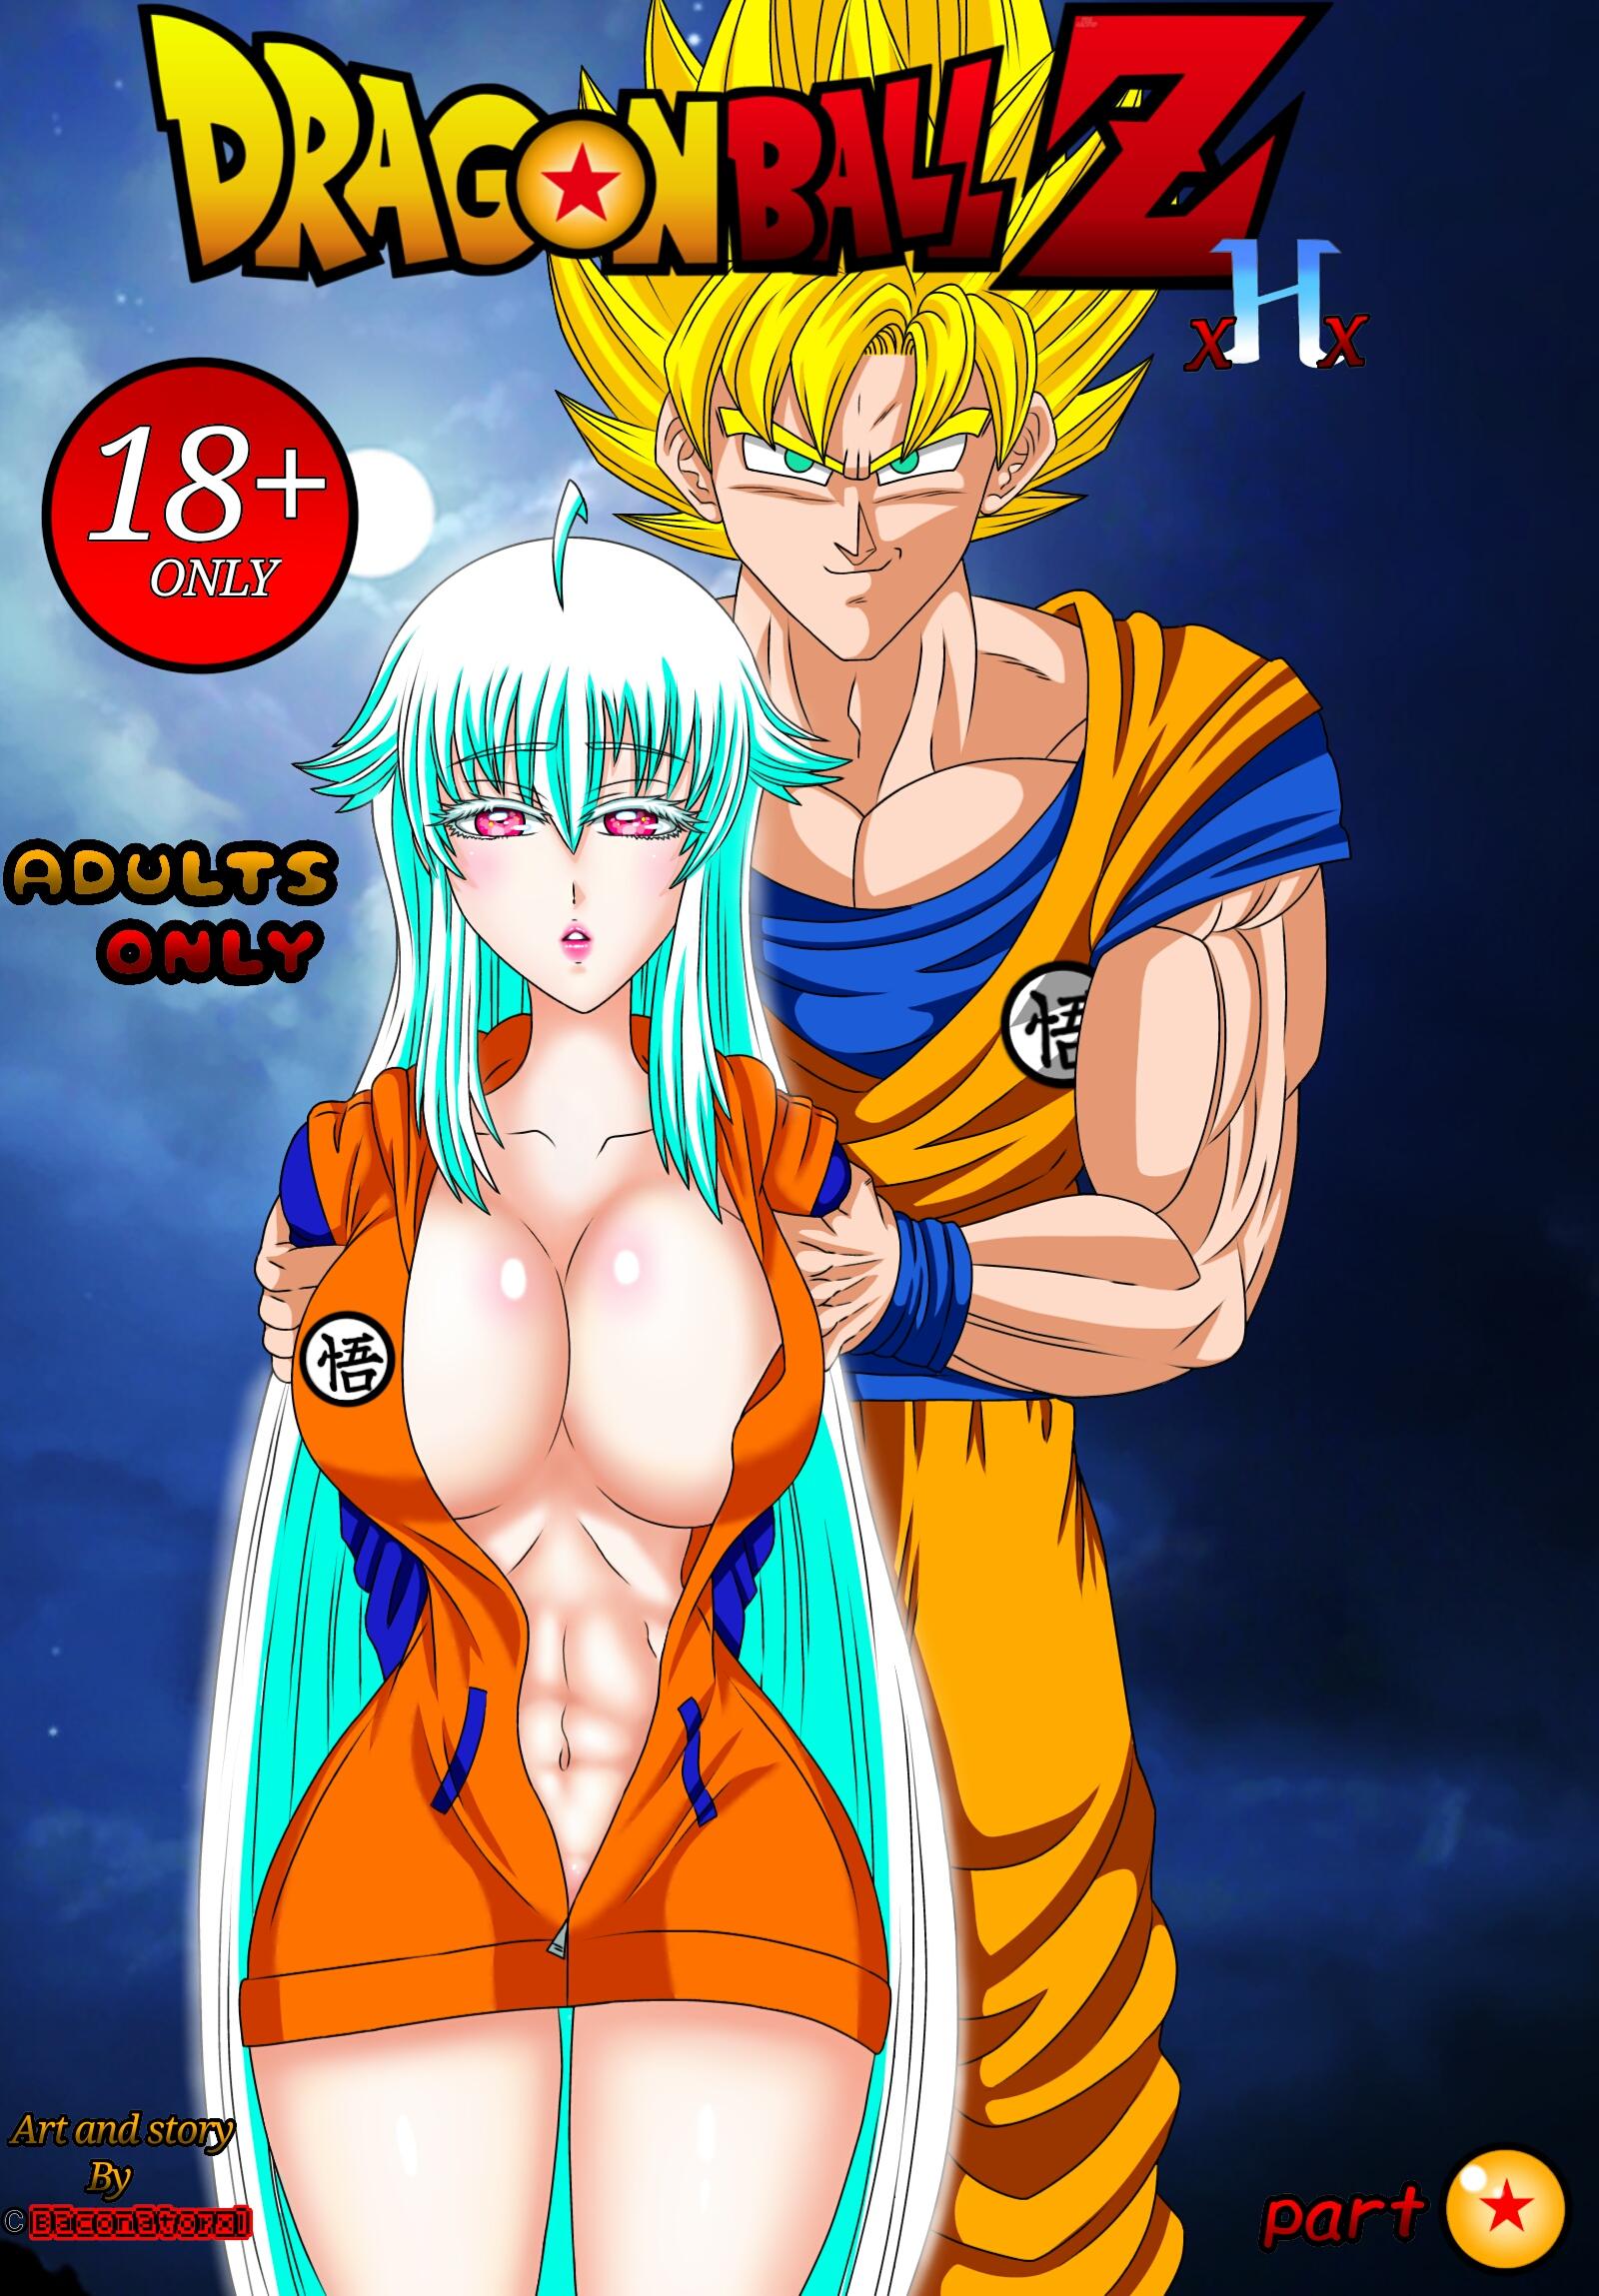 comics sex adult nude porn